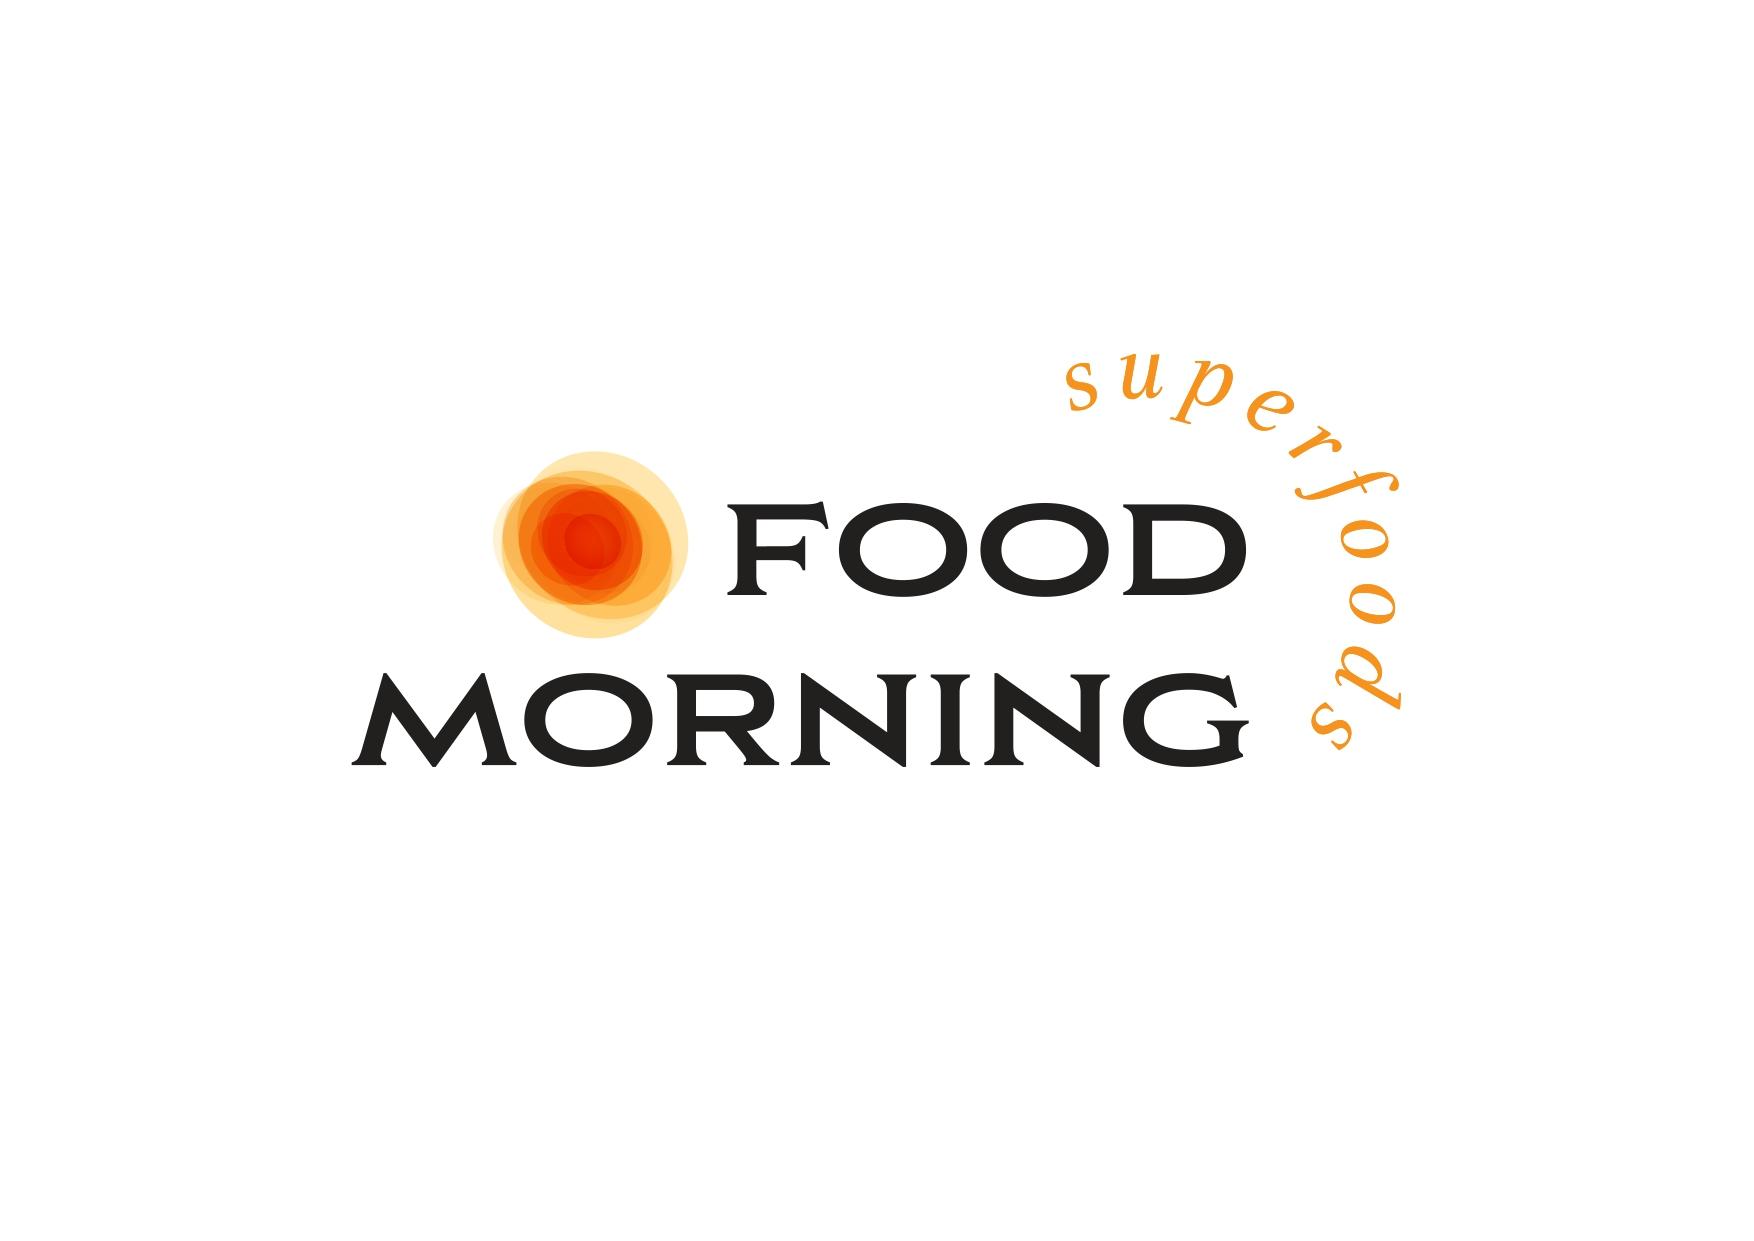 FOOD MORNING